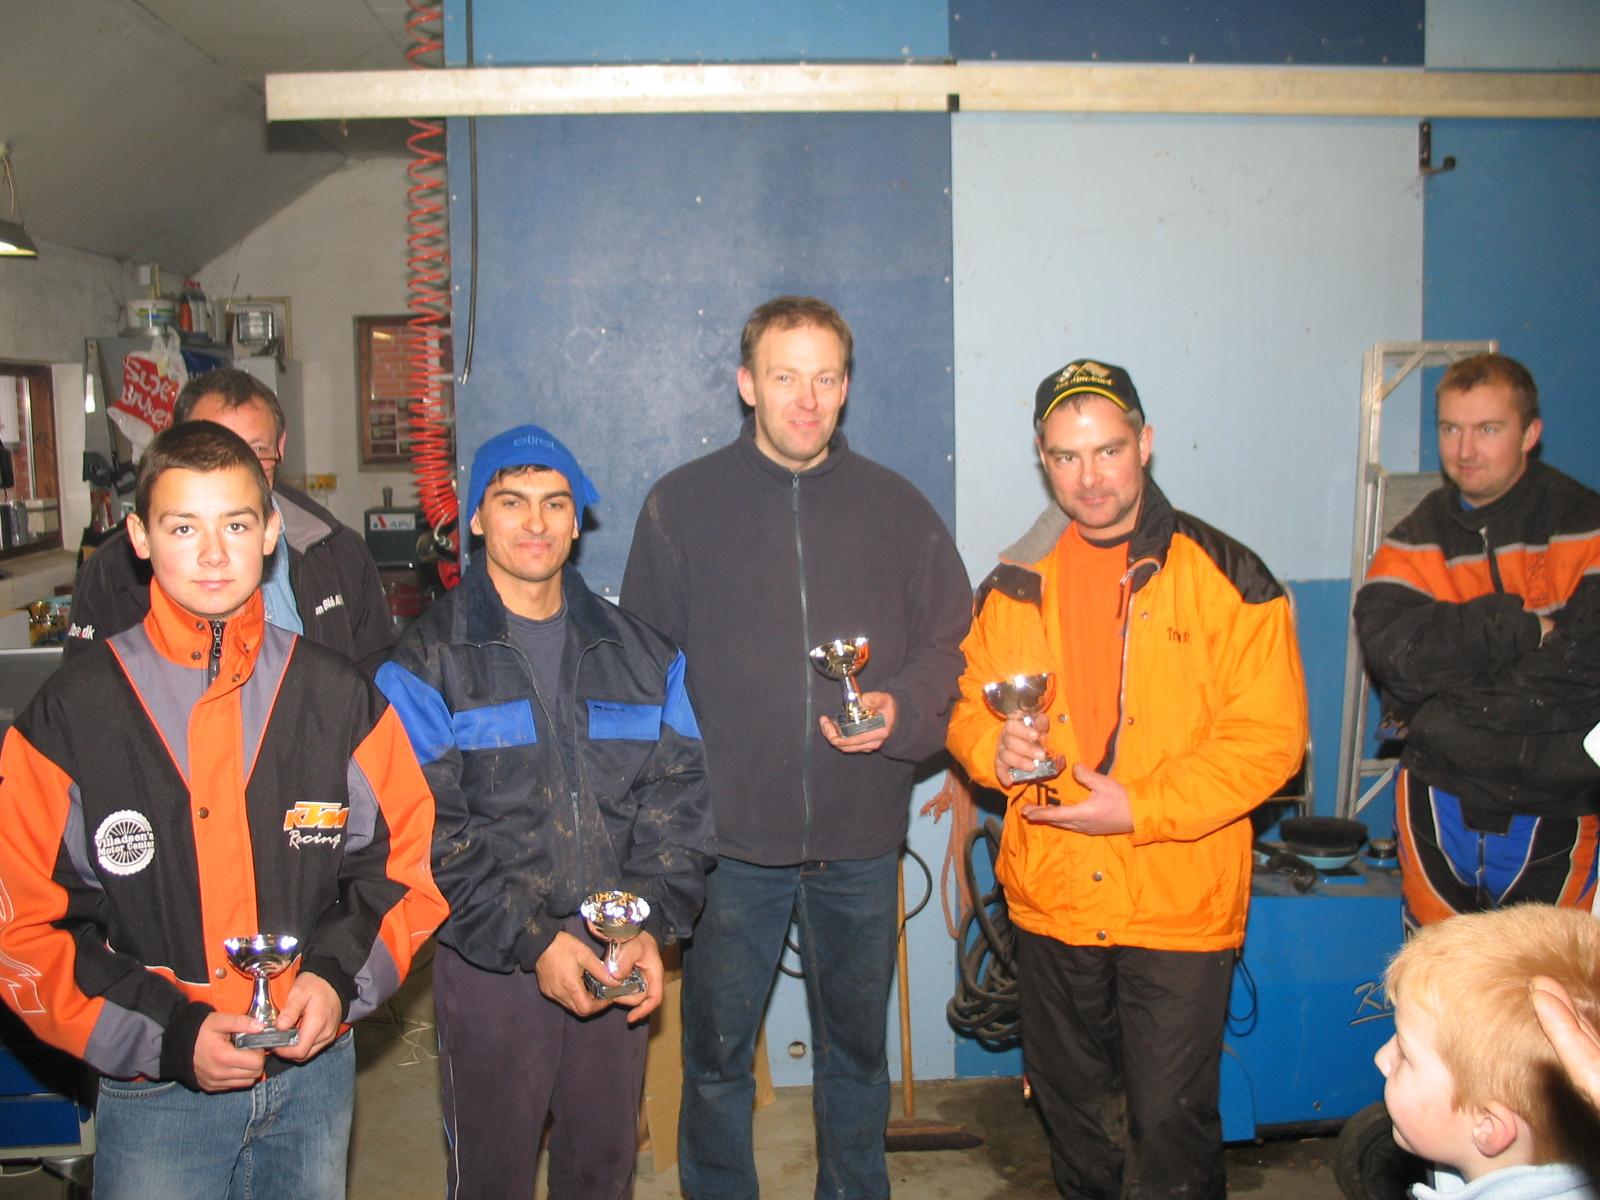 Klassementet. Lars Sørensen vandt foran Benny, Reza og Nick.